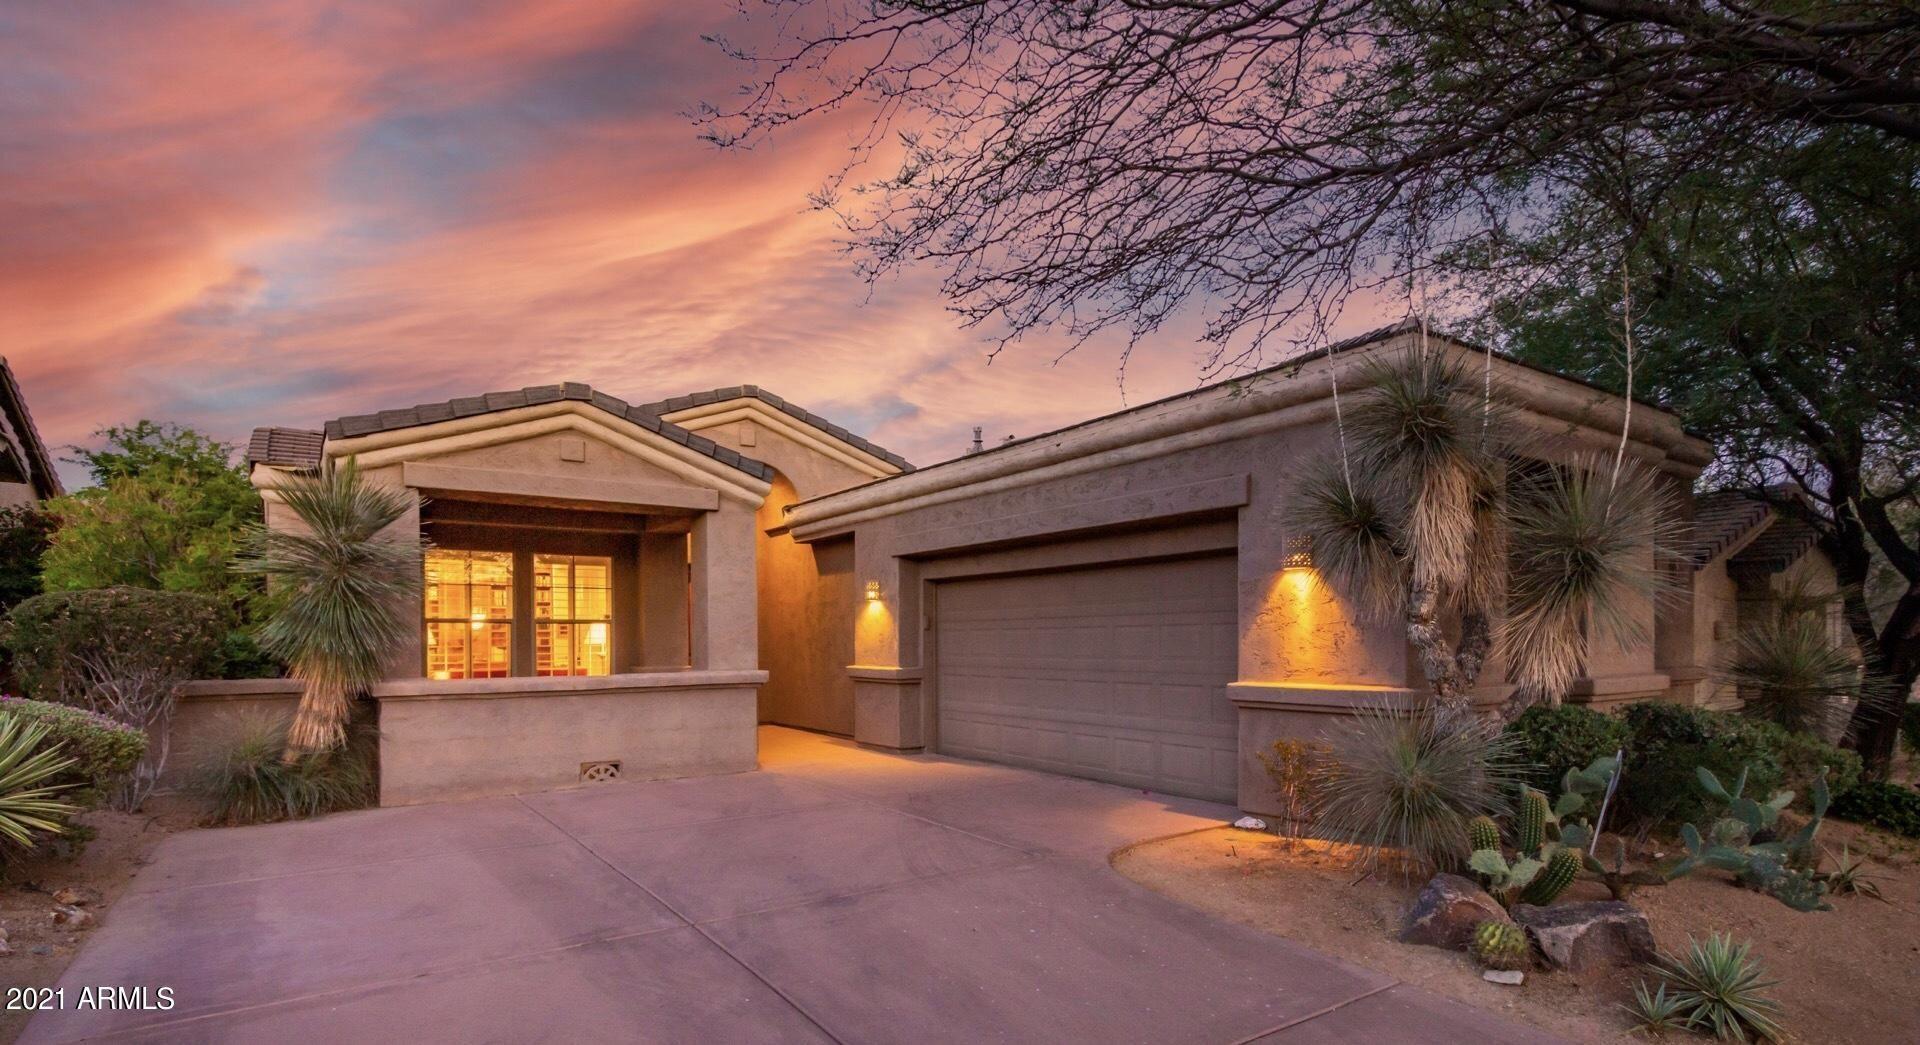 Photo of 20357 N 96TH Way, Scottsdale, AZ 85255 (MLS # 6243256)